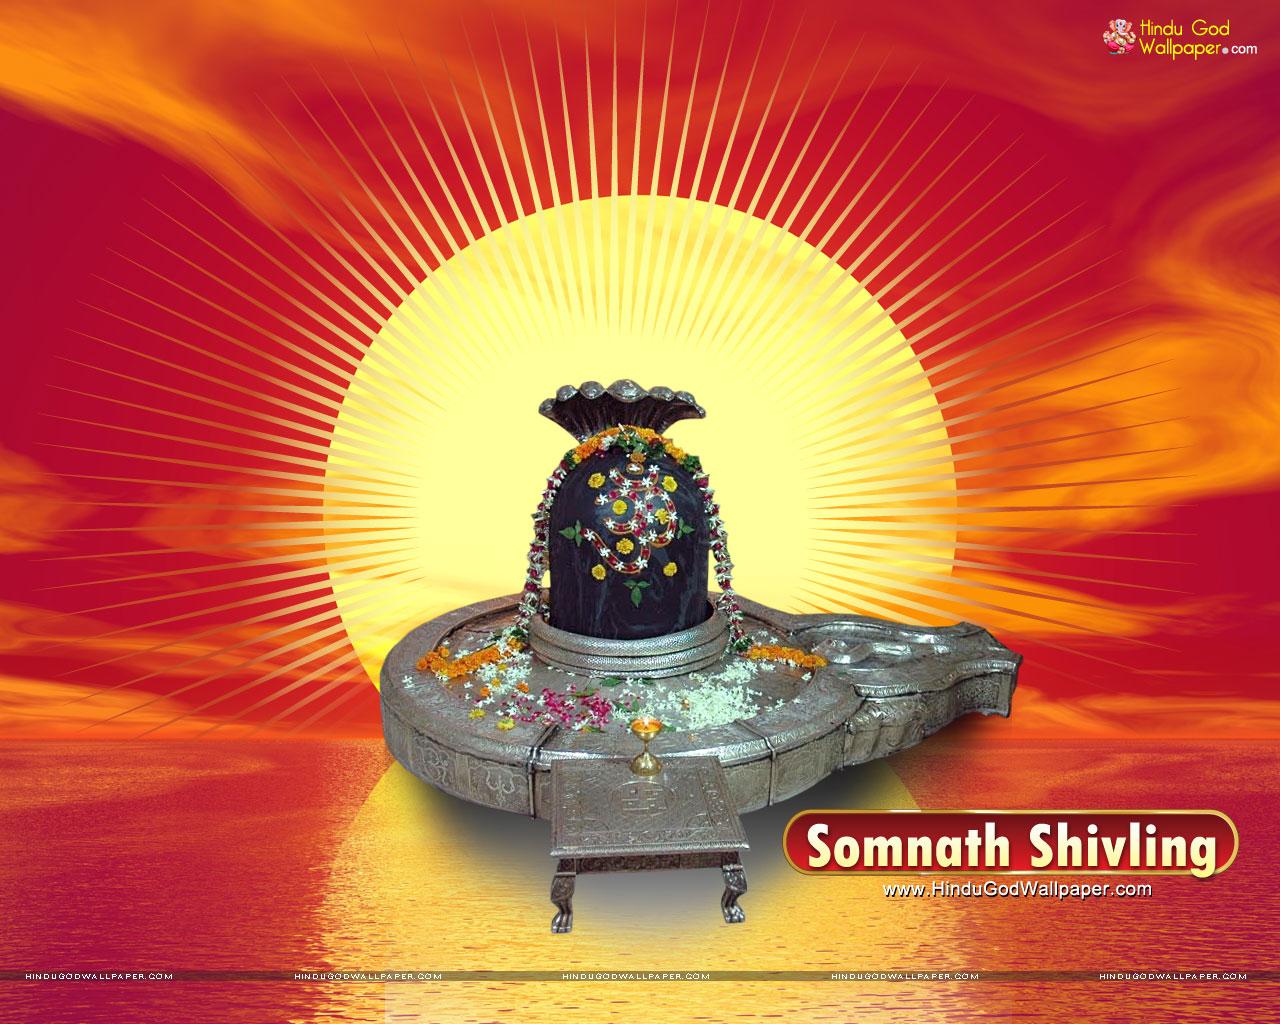 somnath shivling wallpaper